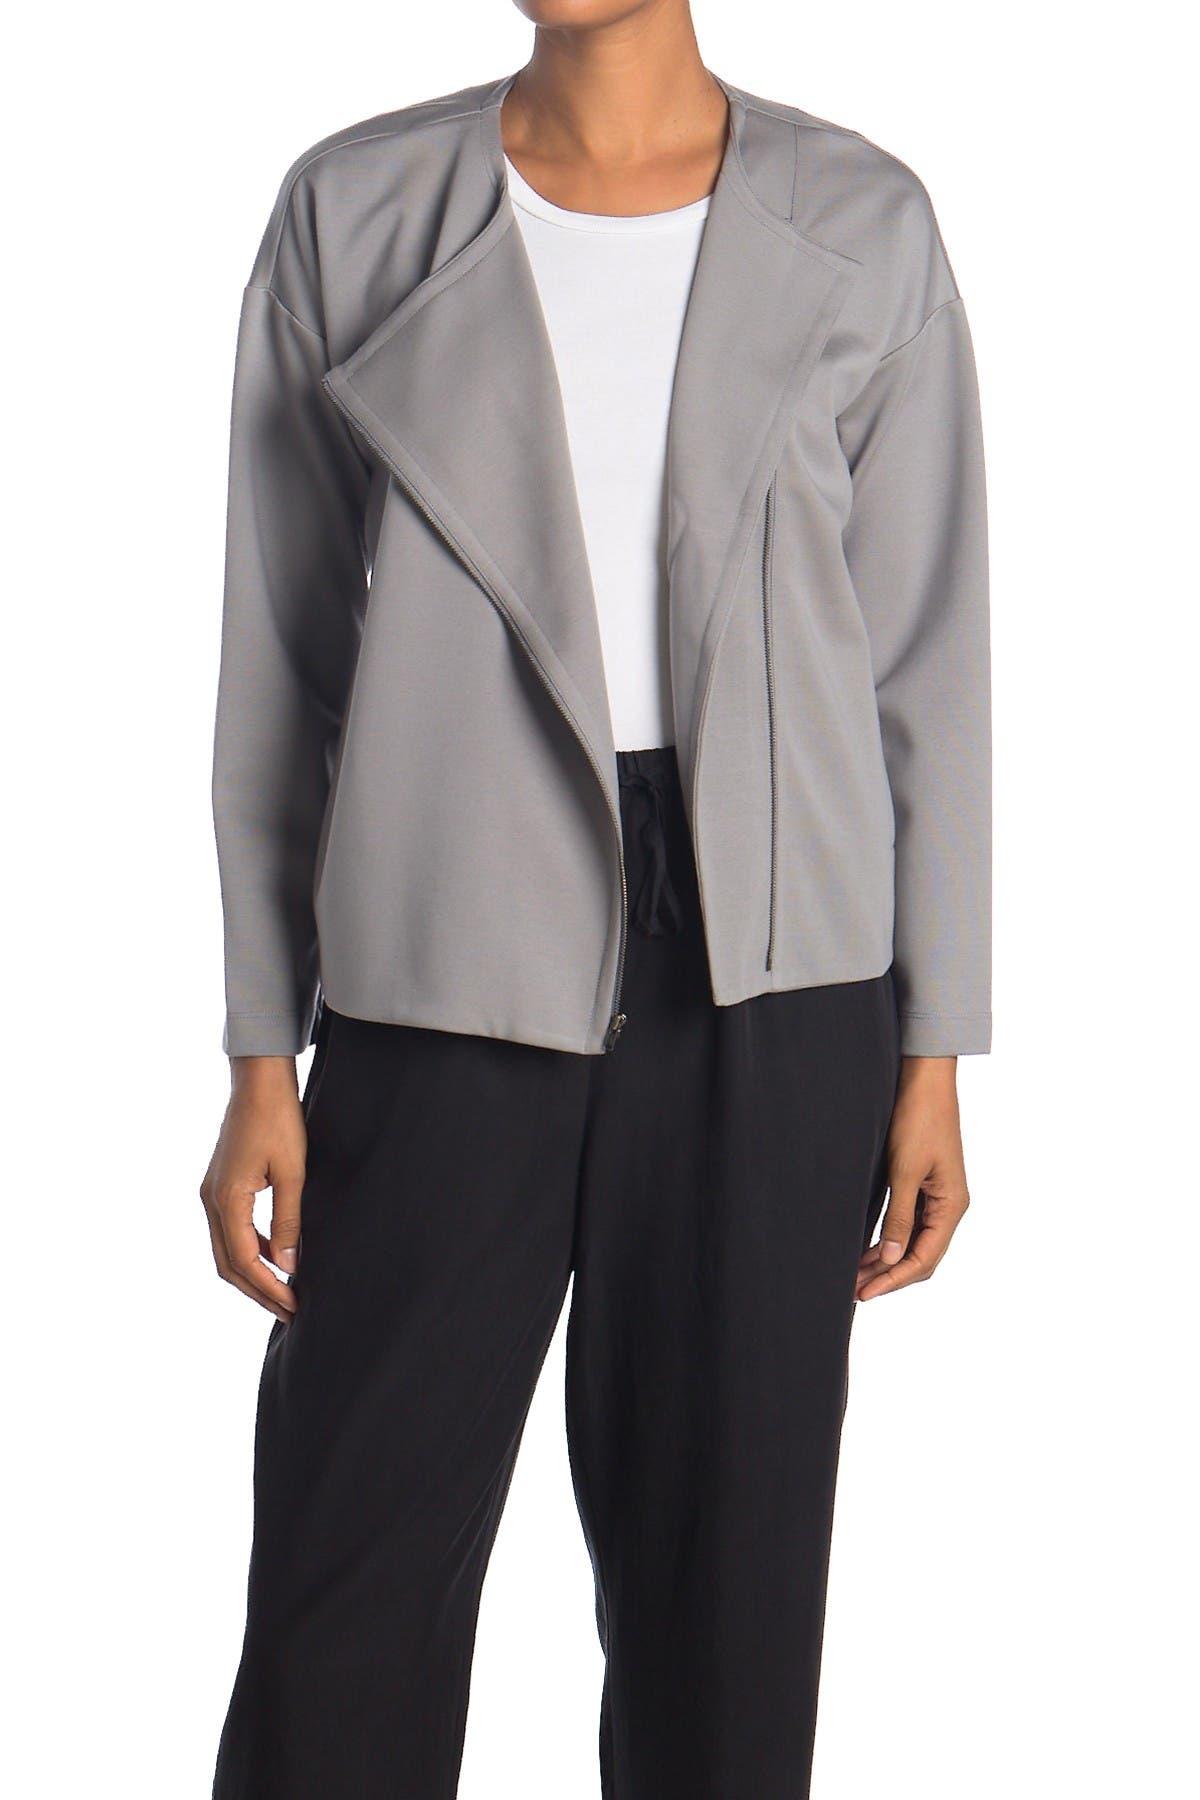 Image of Eileen Fisher Asymmetrical Zip Jacket